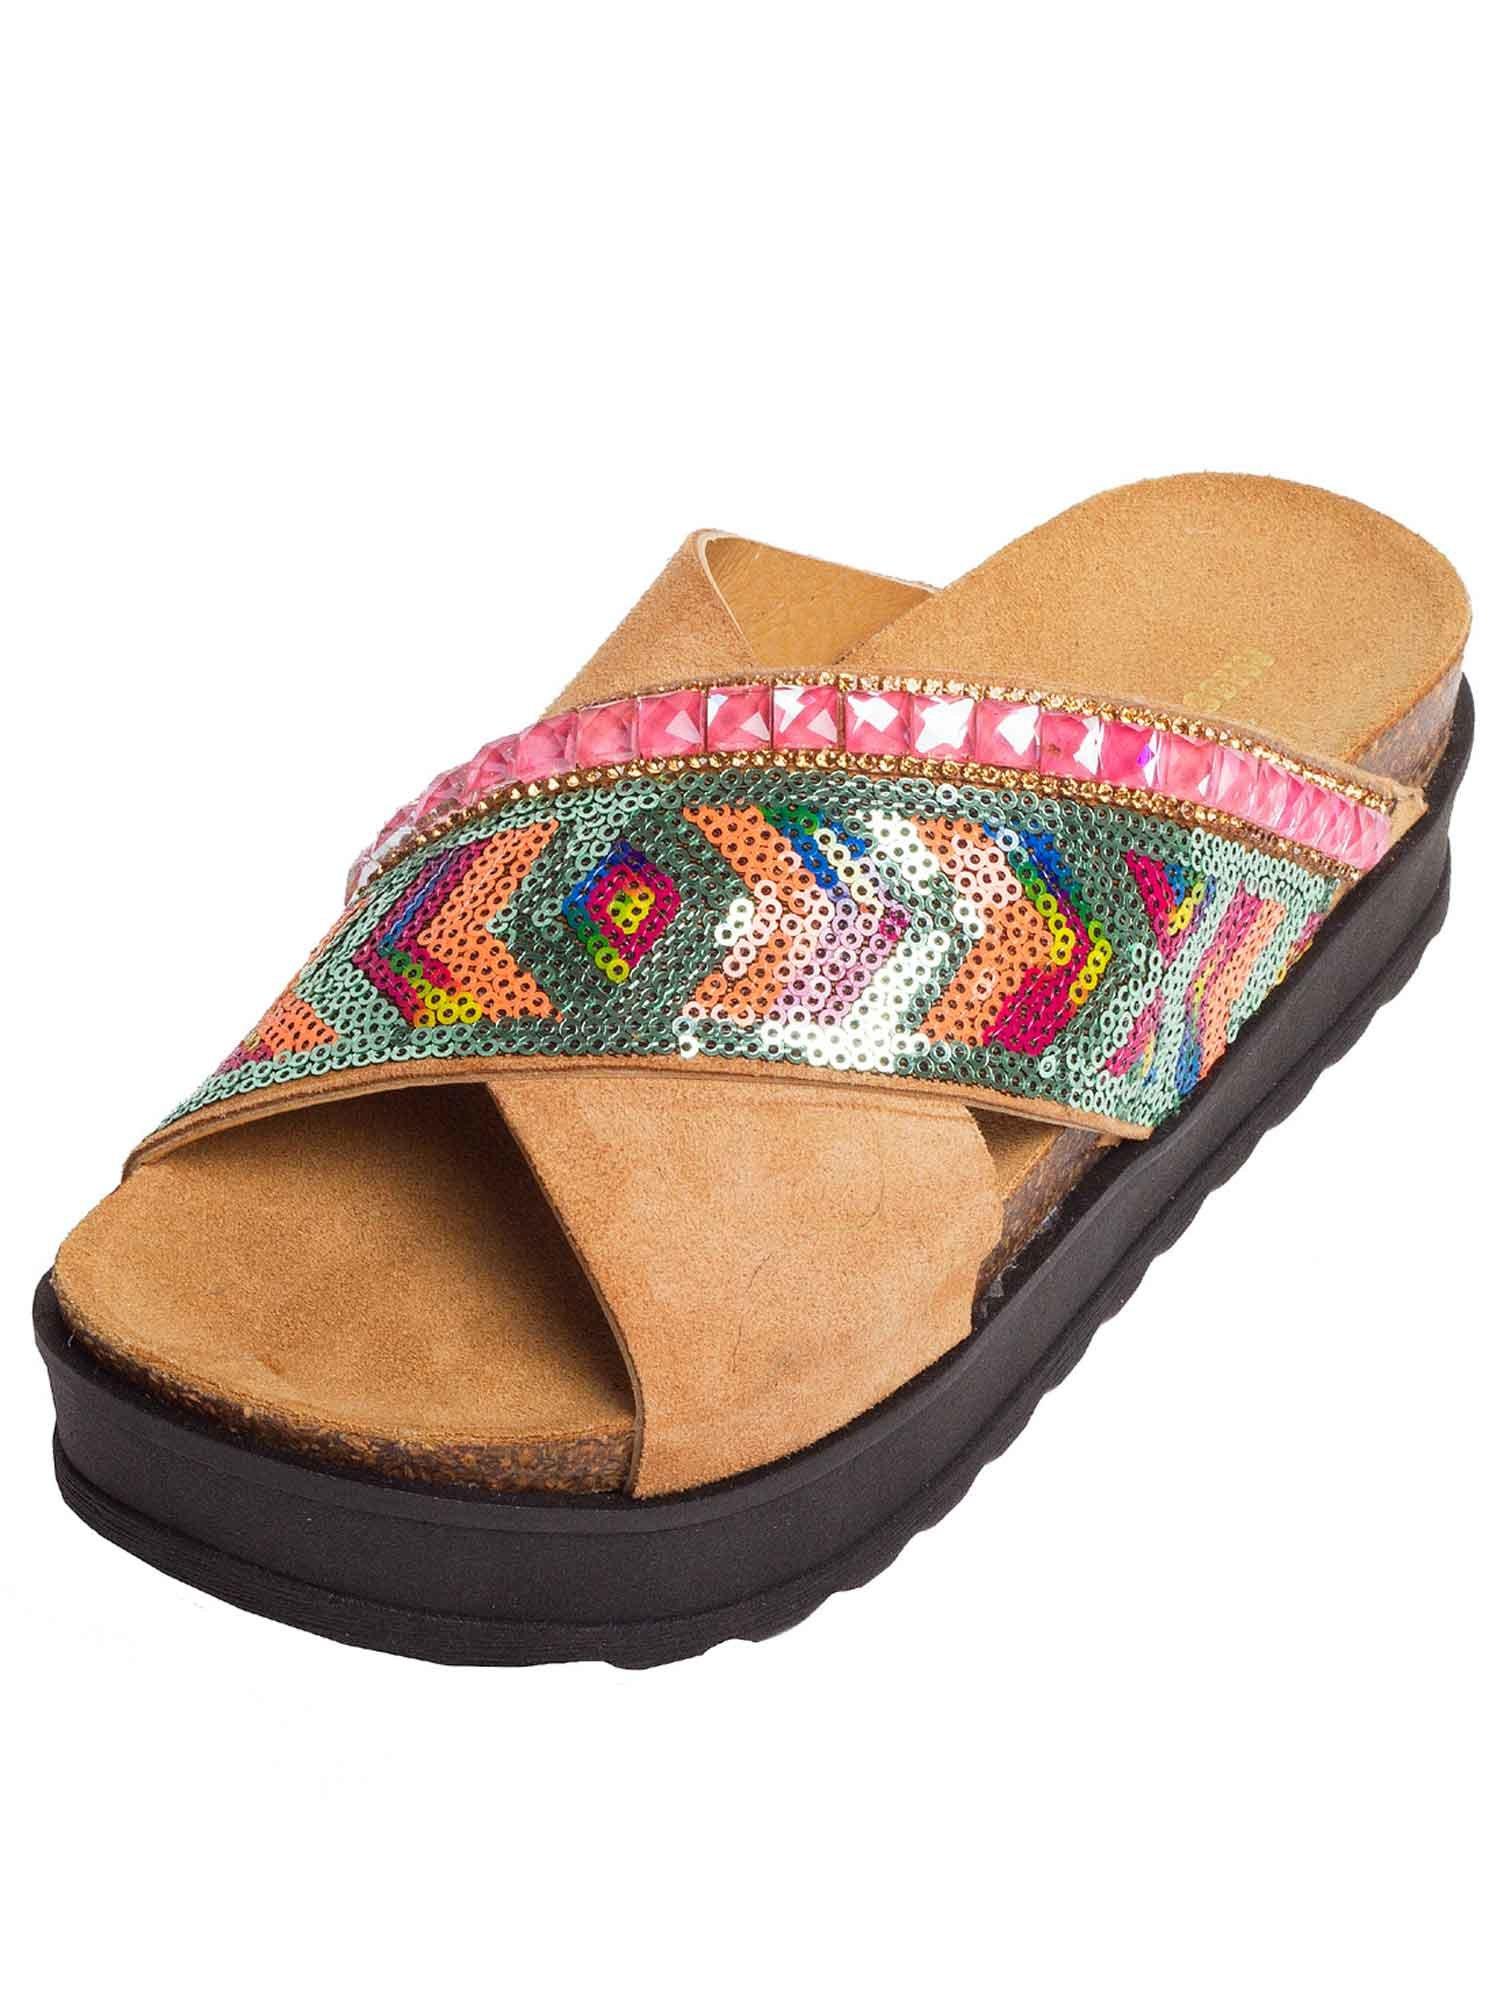 Sequins Sandal - Leather